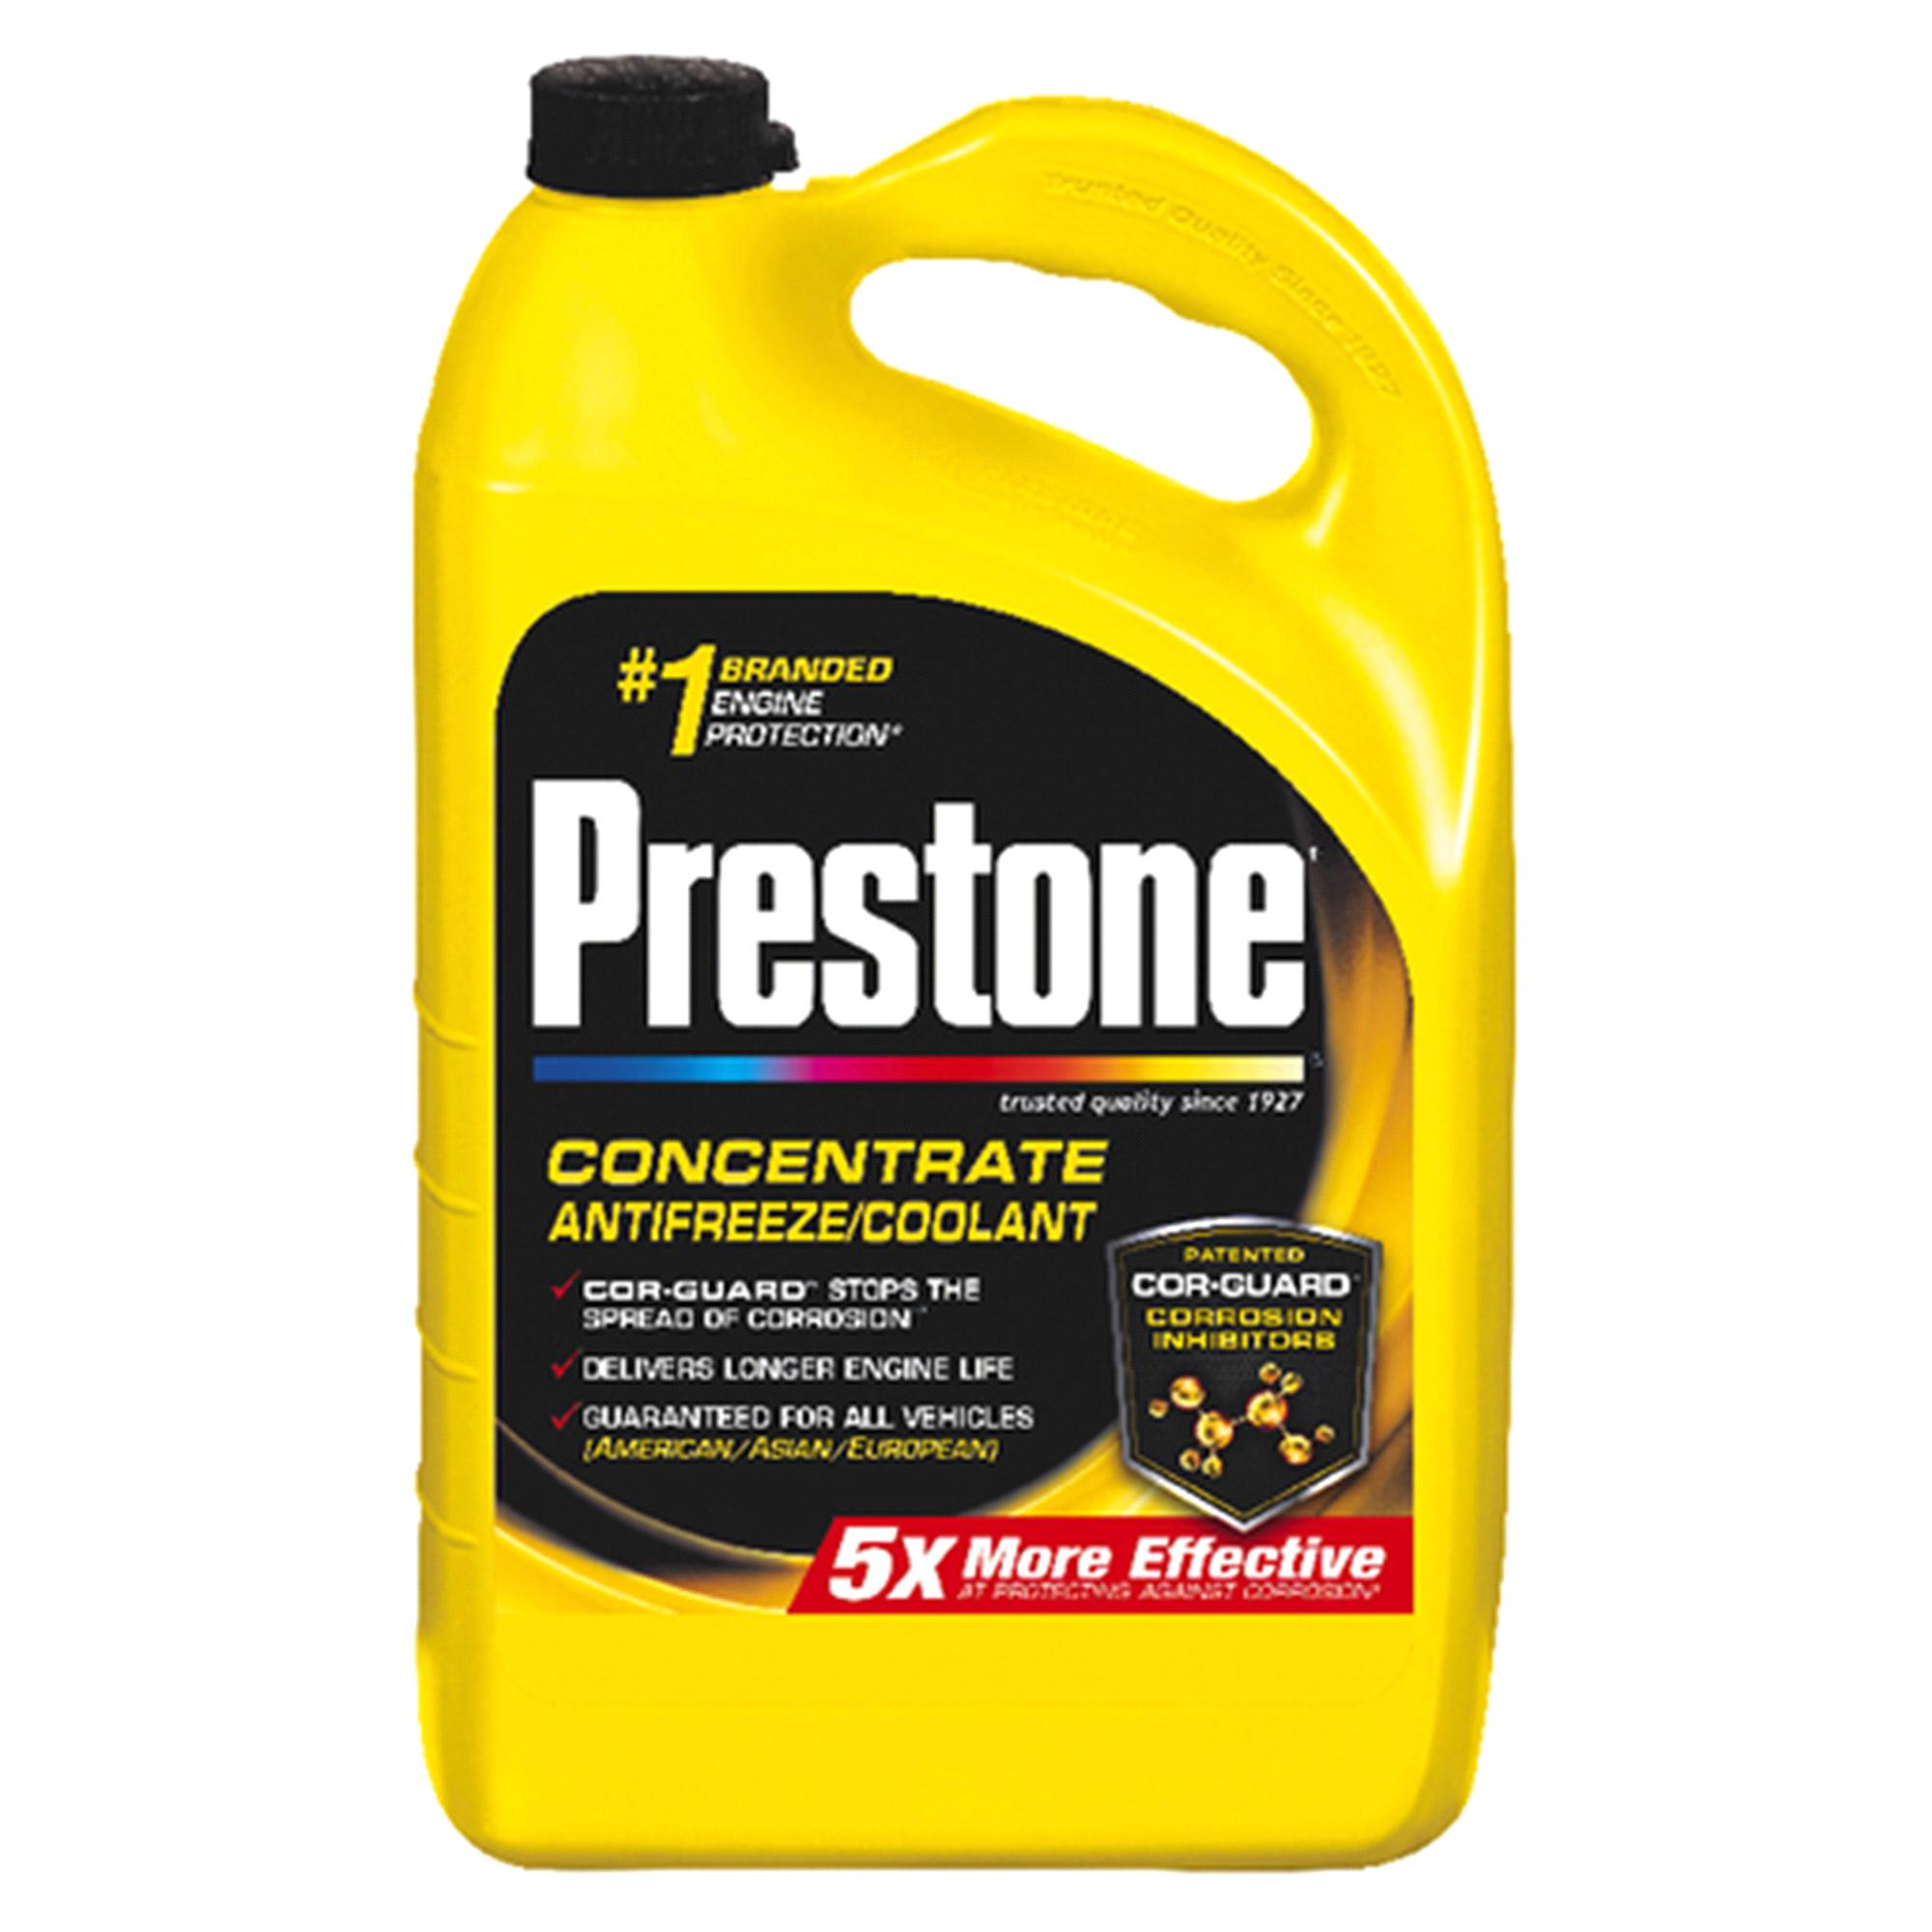 Automotive Garbage Disposal Dishwasher Wiring On Garage For Welder Prestone Full Strength Extended Life Antifreeze Gallon